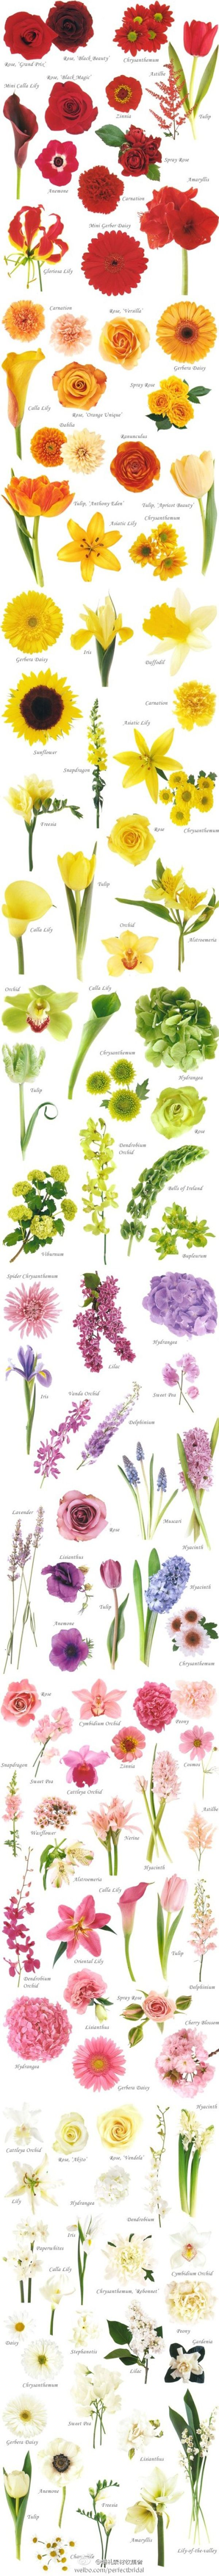 Flower Names By Color Floral Design Flowers Pinterest Flower